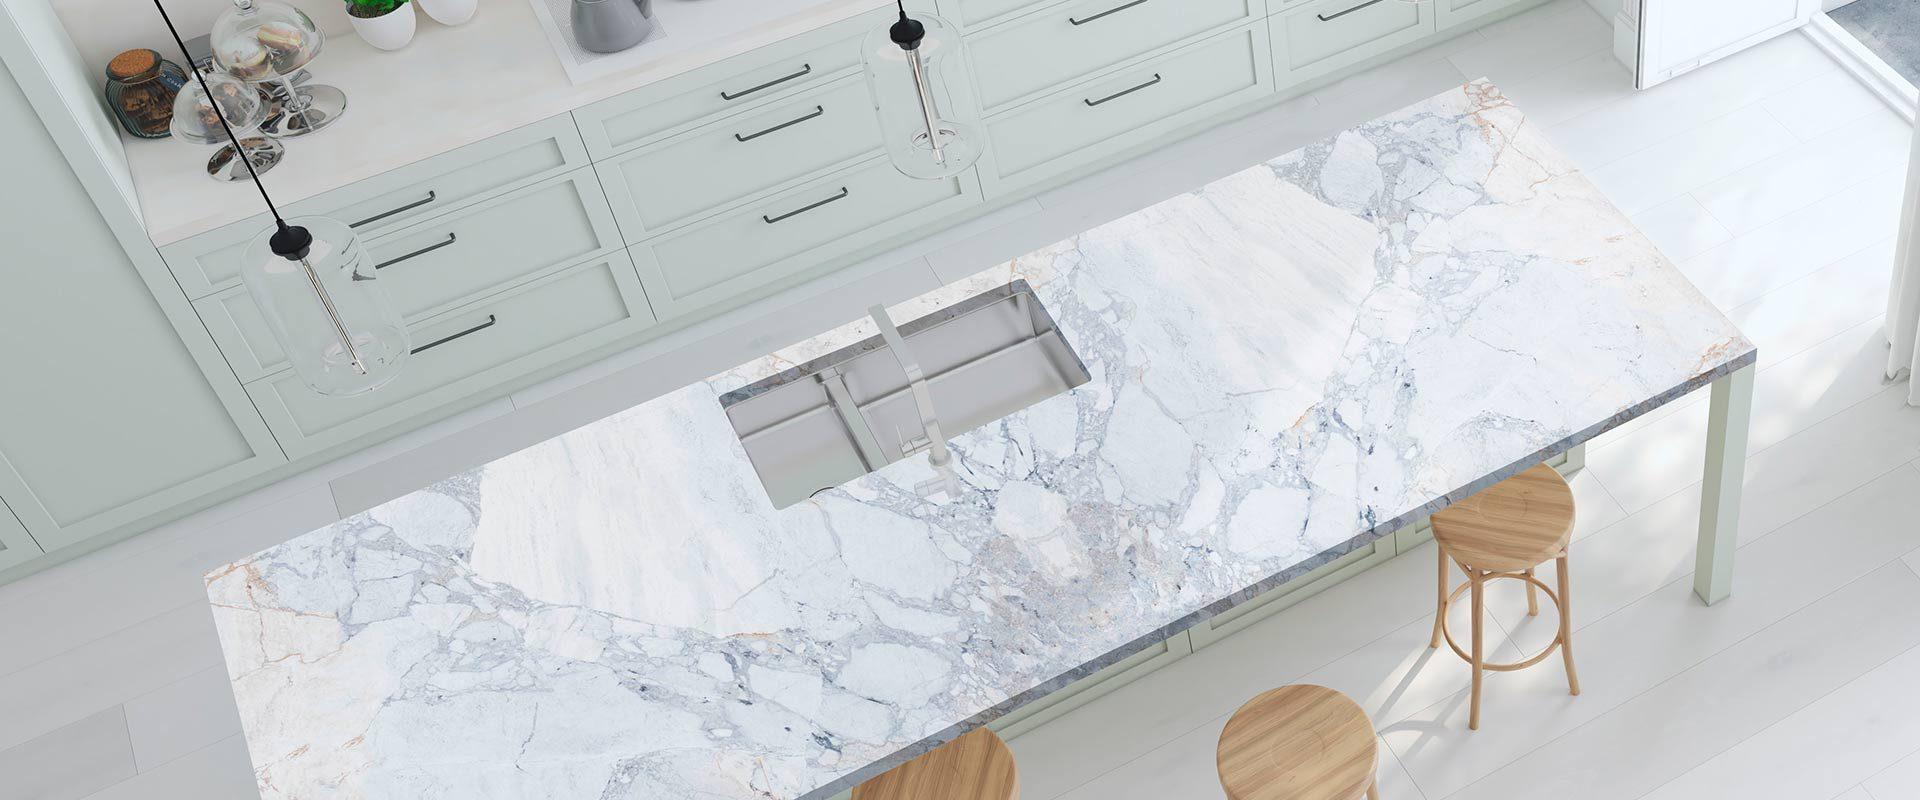 cozinha-topview-Michelangelo-Prime-126260